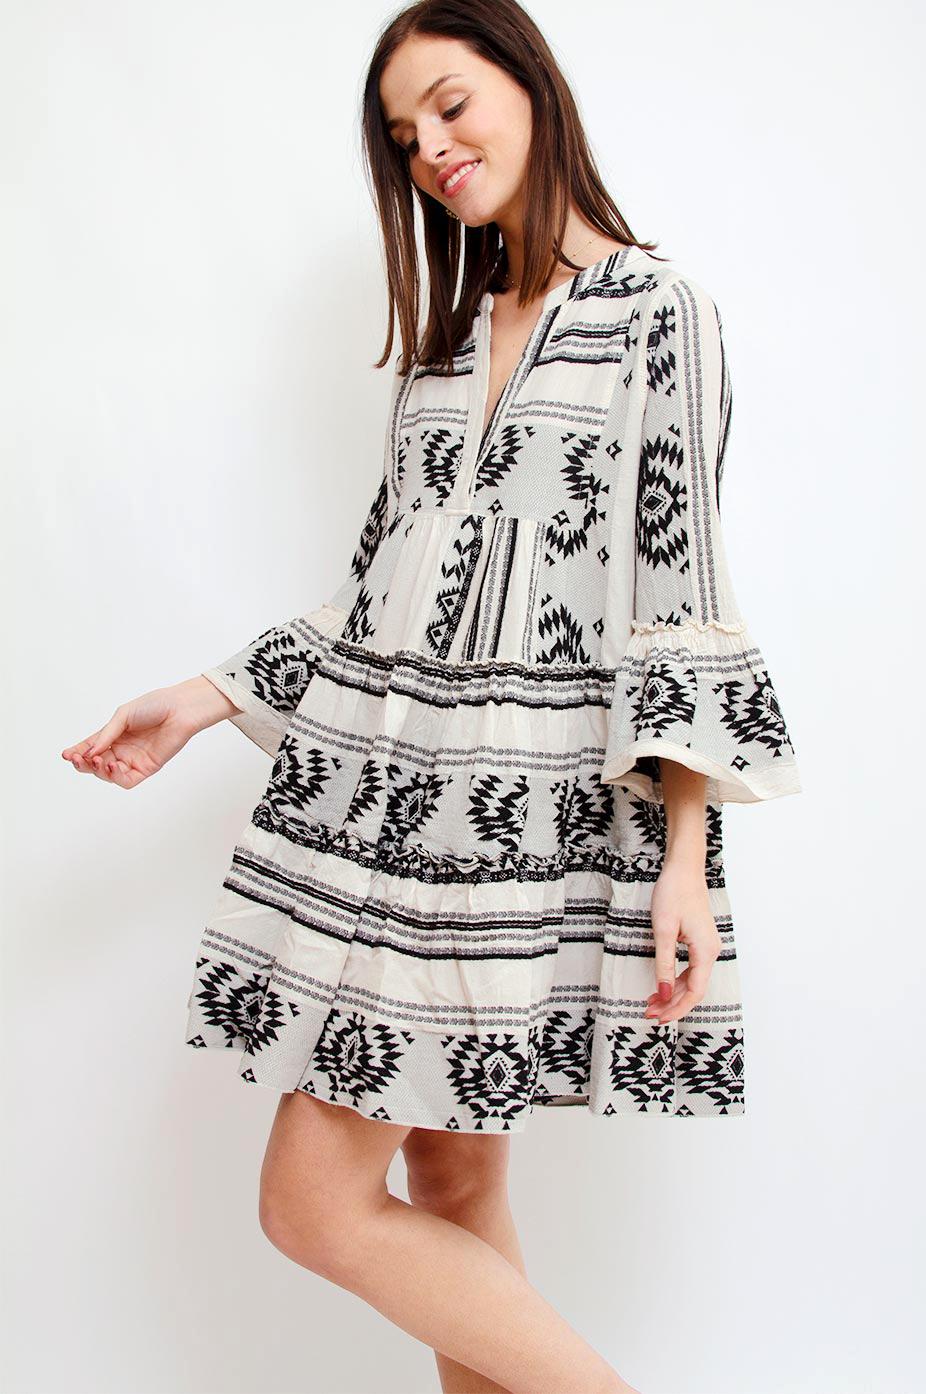 DEVOTION Black Devotion Aztek Ioli Embroidery Dress